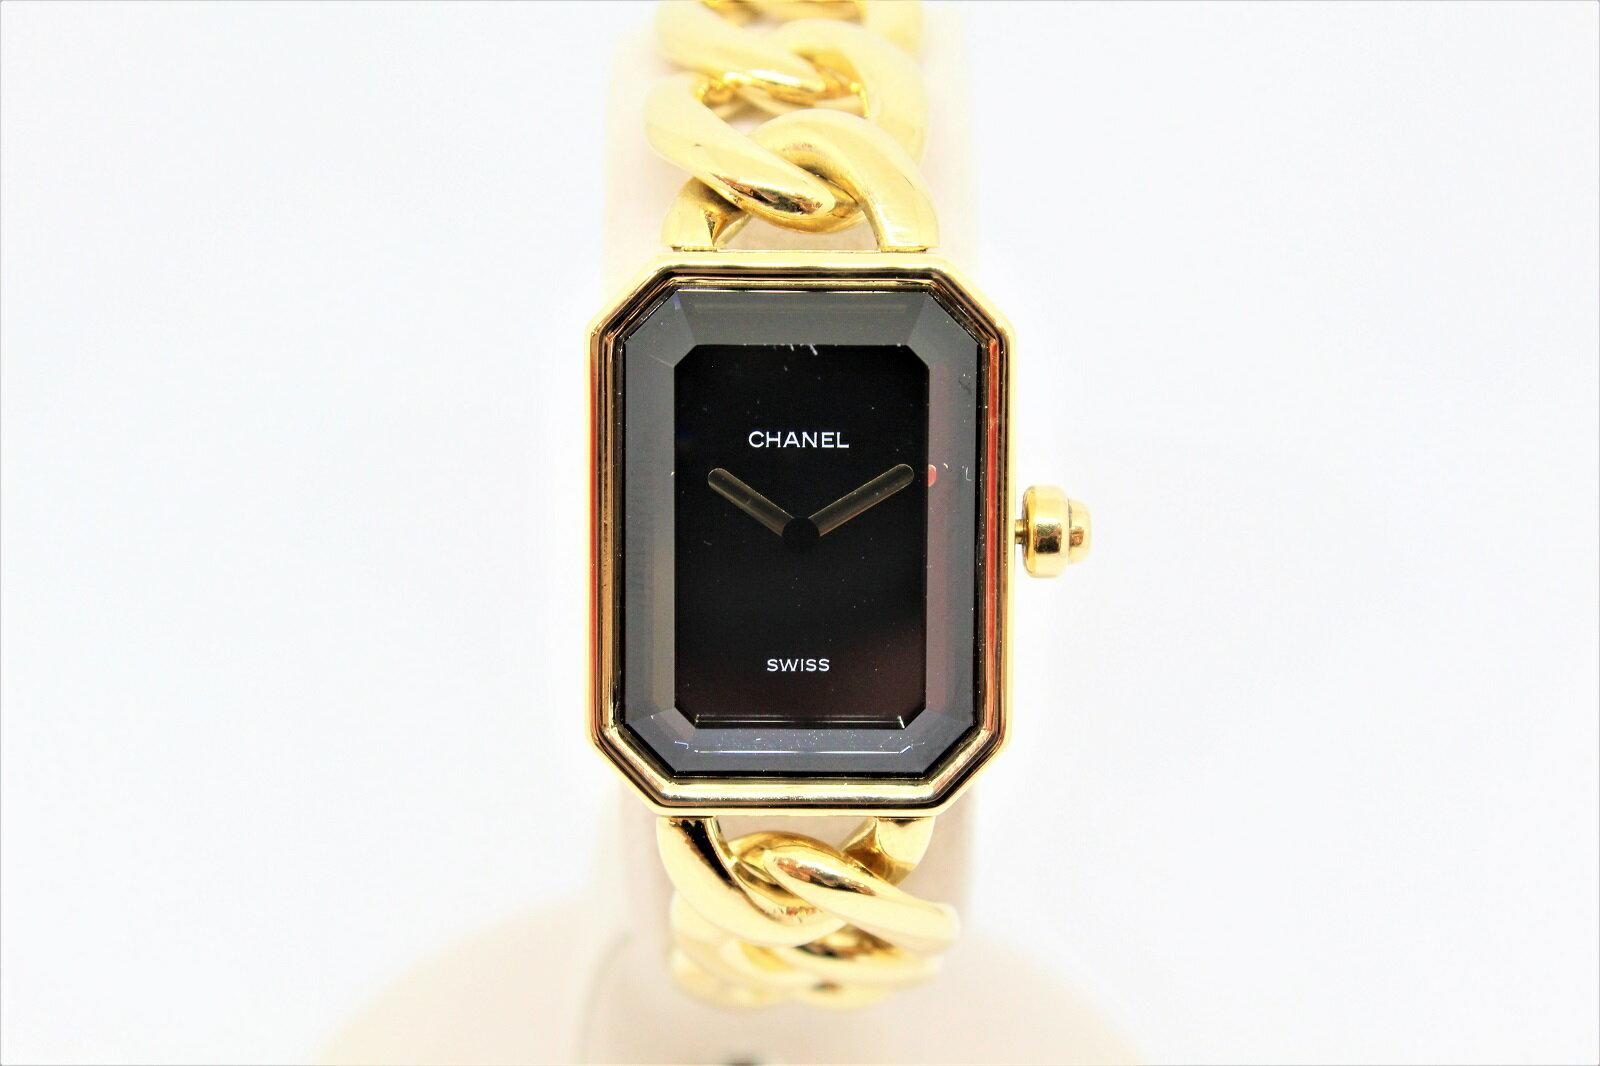 【K18】CHANEL シャネル プルミエール H0003 Lサイズ YG イエローゴールド ブレスレット レディース 腕時計 ウォッチ 【中古】